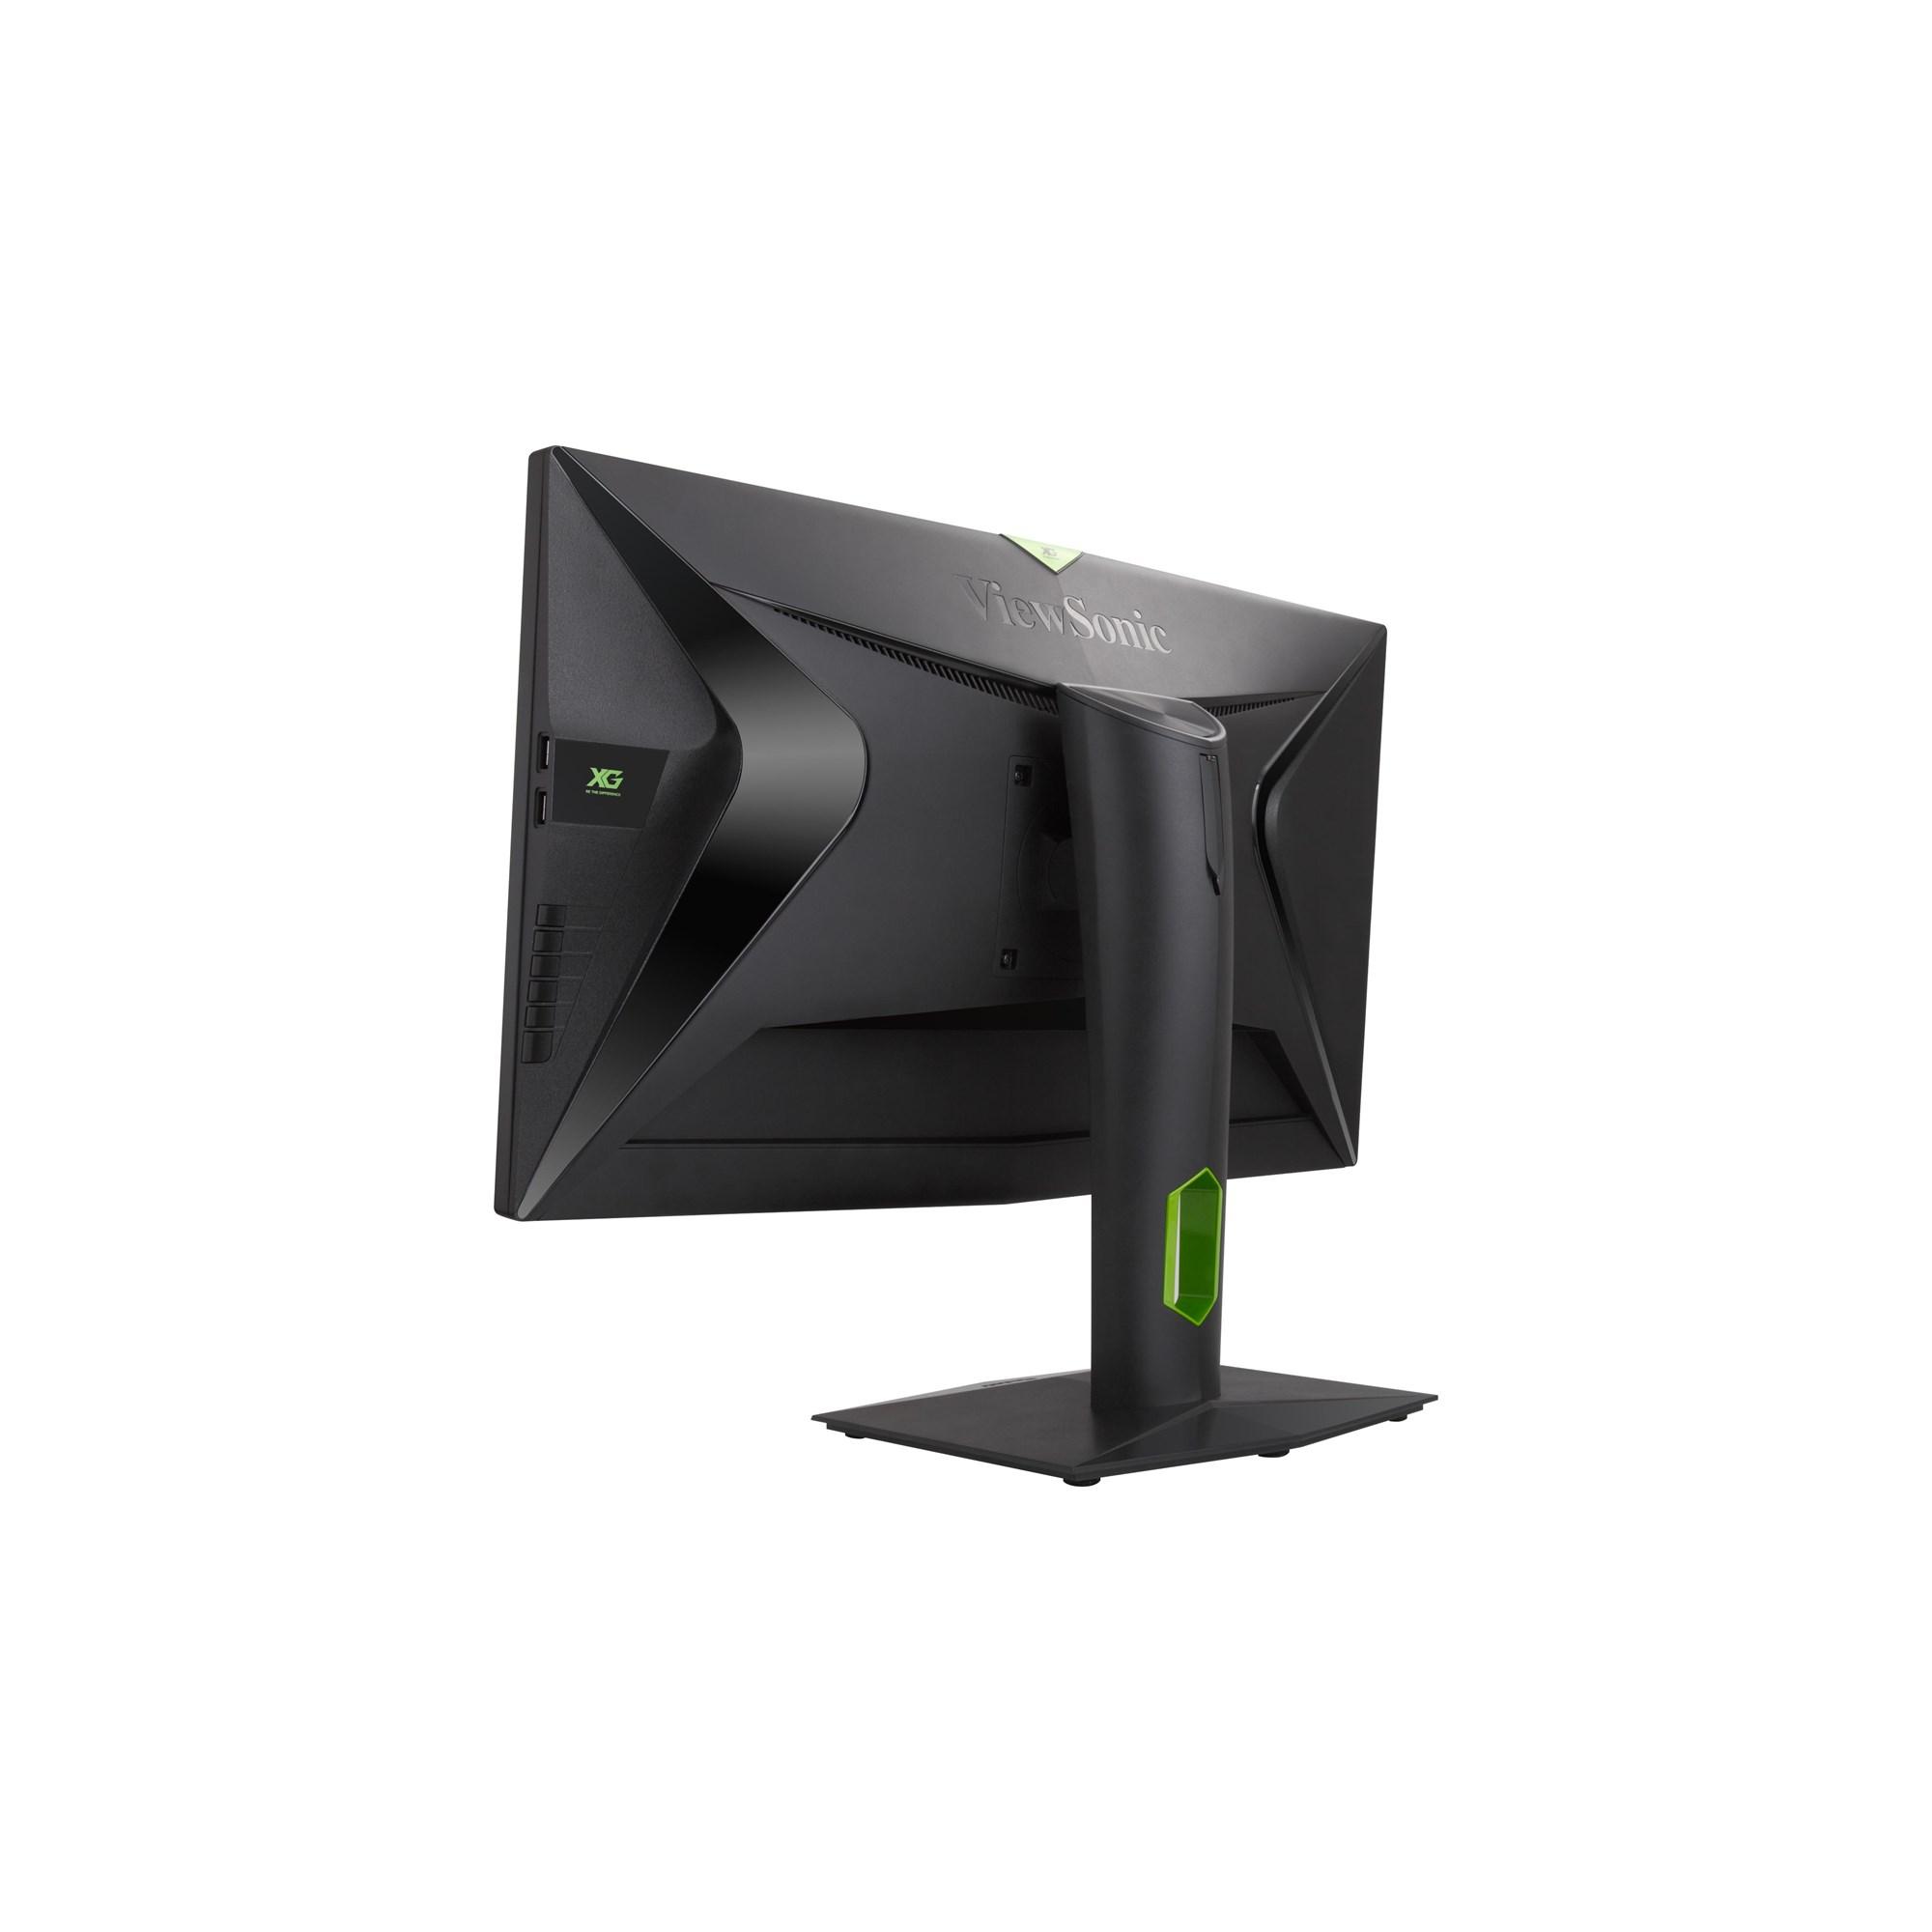 ViewSonic XG2703-GS (27 inch) Gaming Monitor 1000:1 350cd/m2 2560 x 1440  4ms (Black) *Open Box*